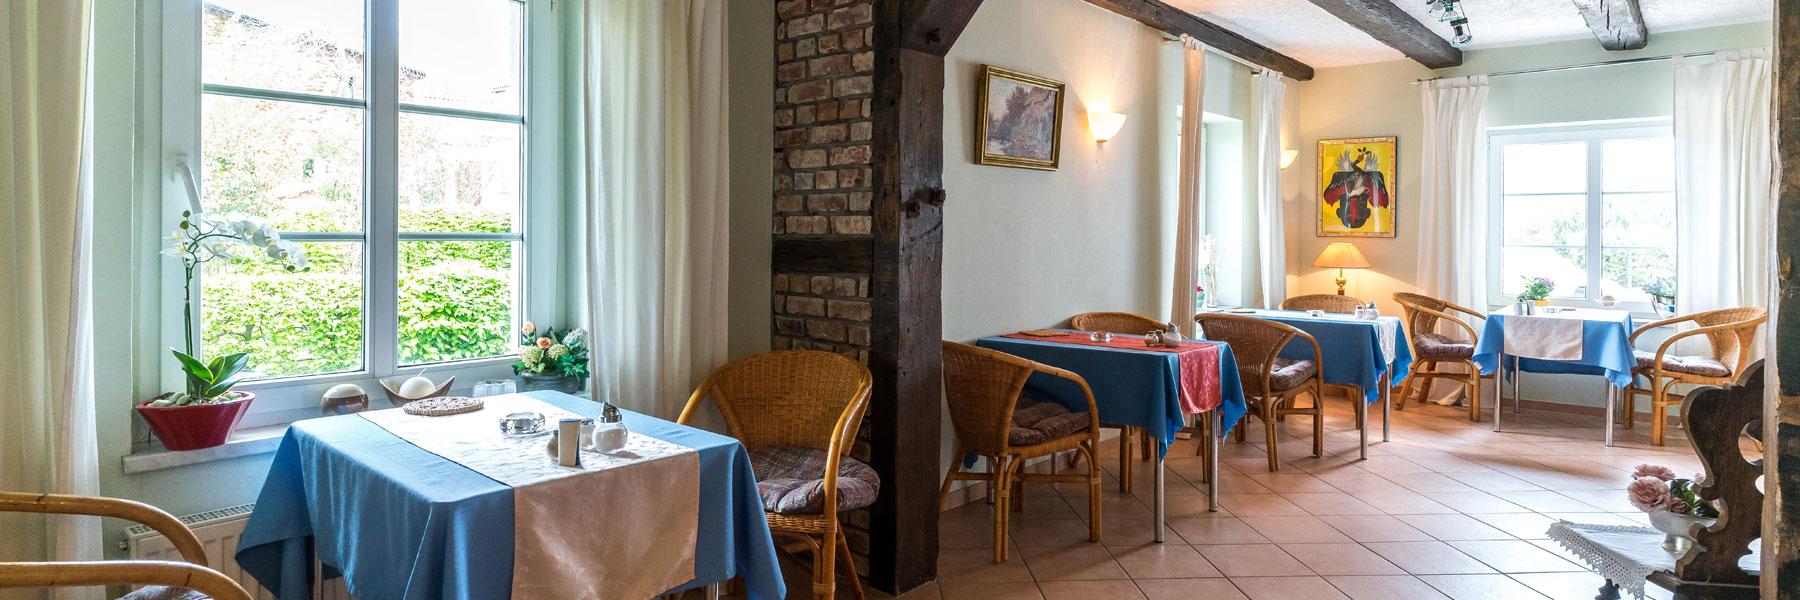 Frühstücksraum - Gästehaus Bade